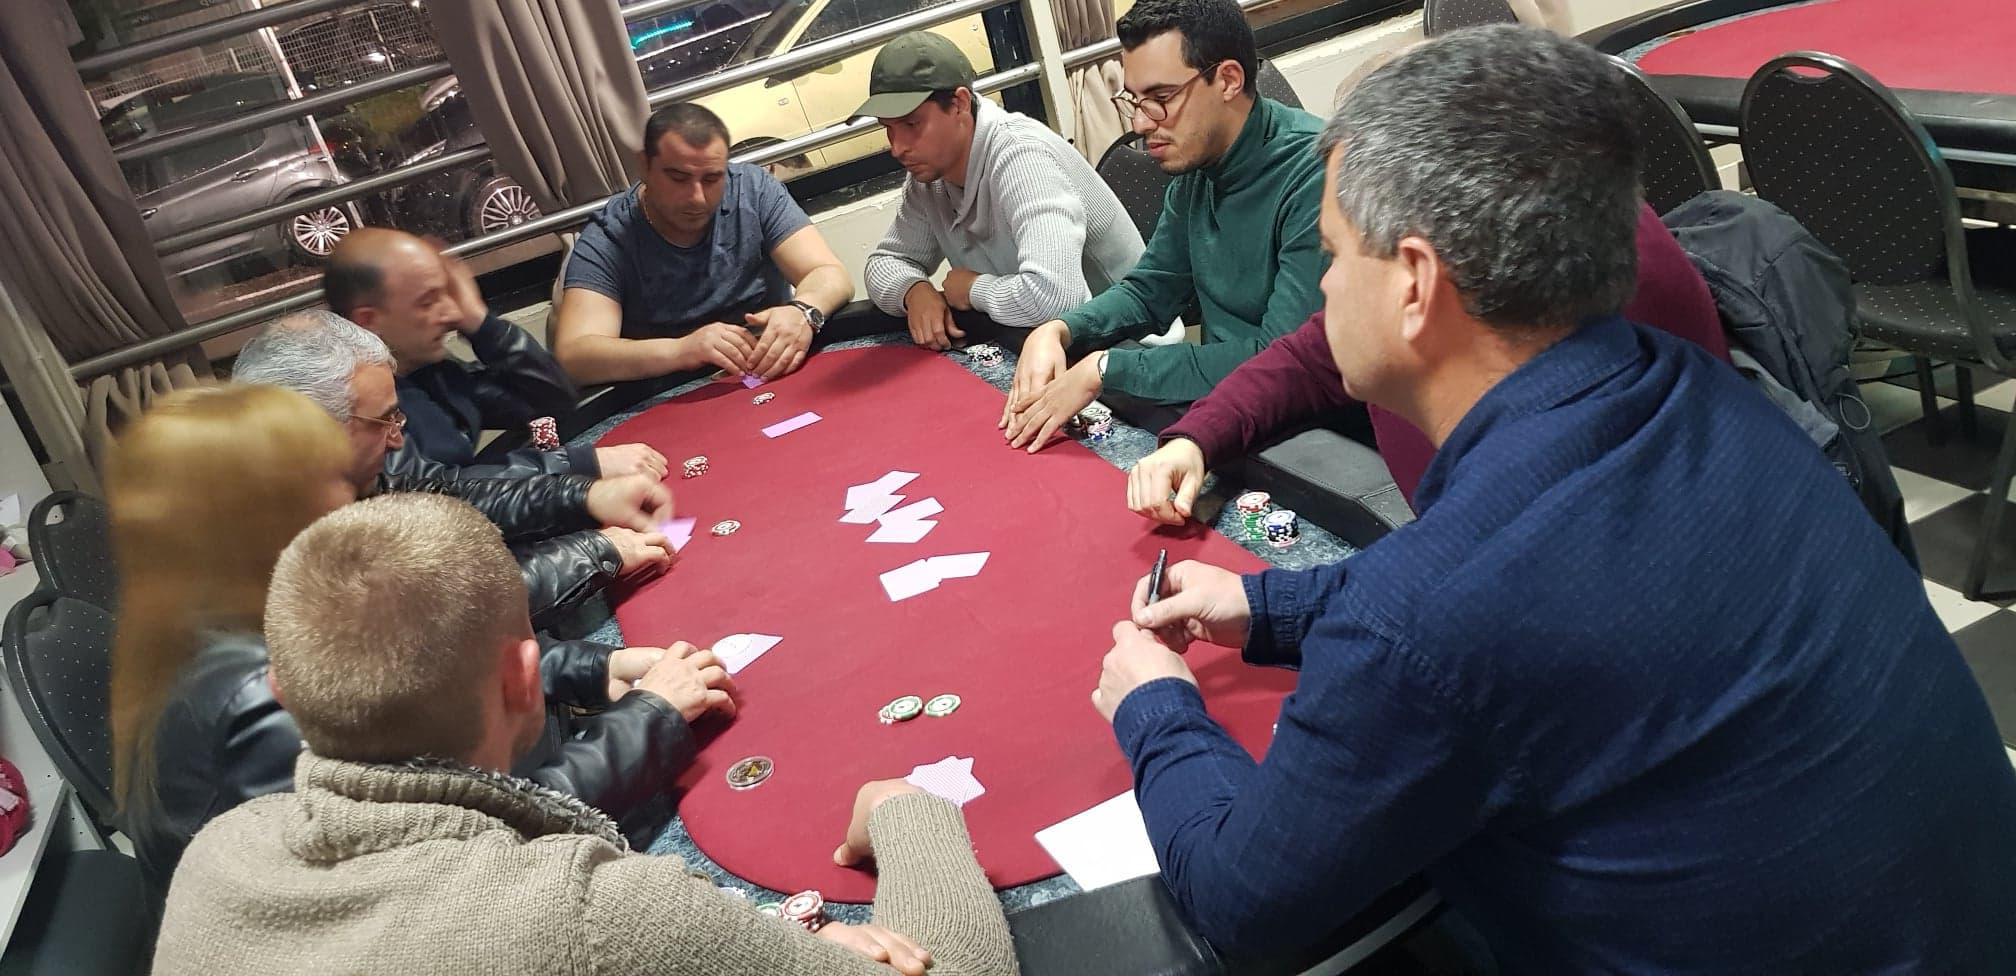 poker au city 2